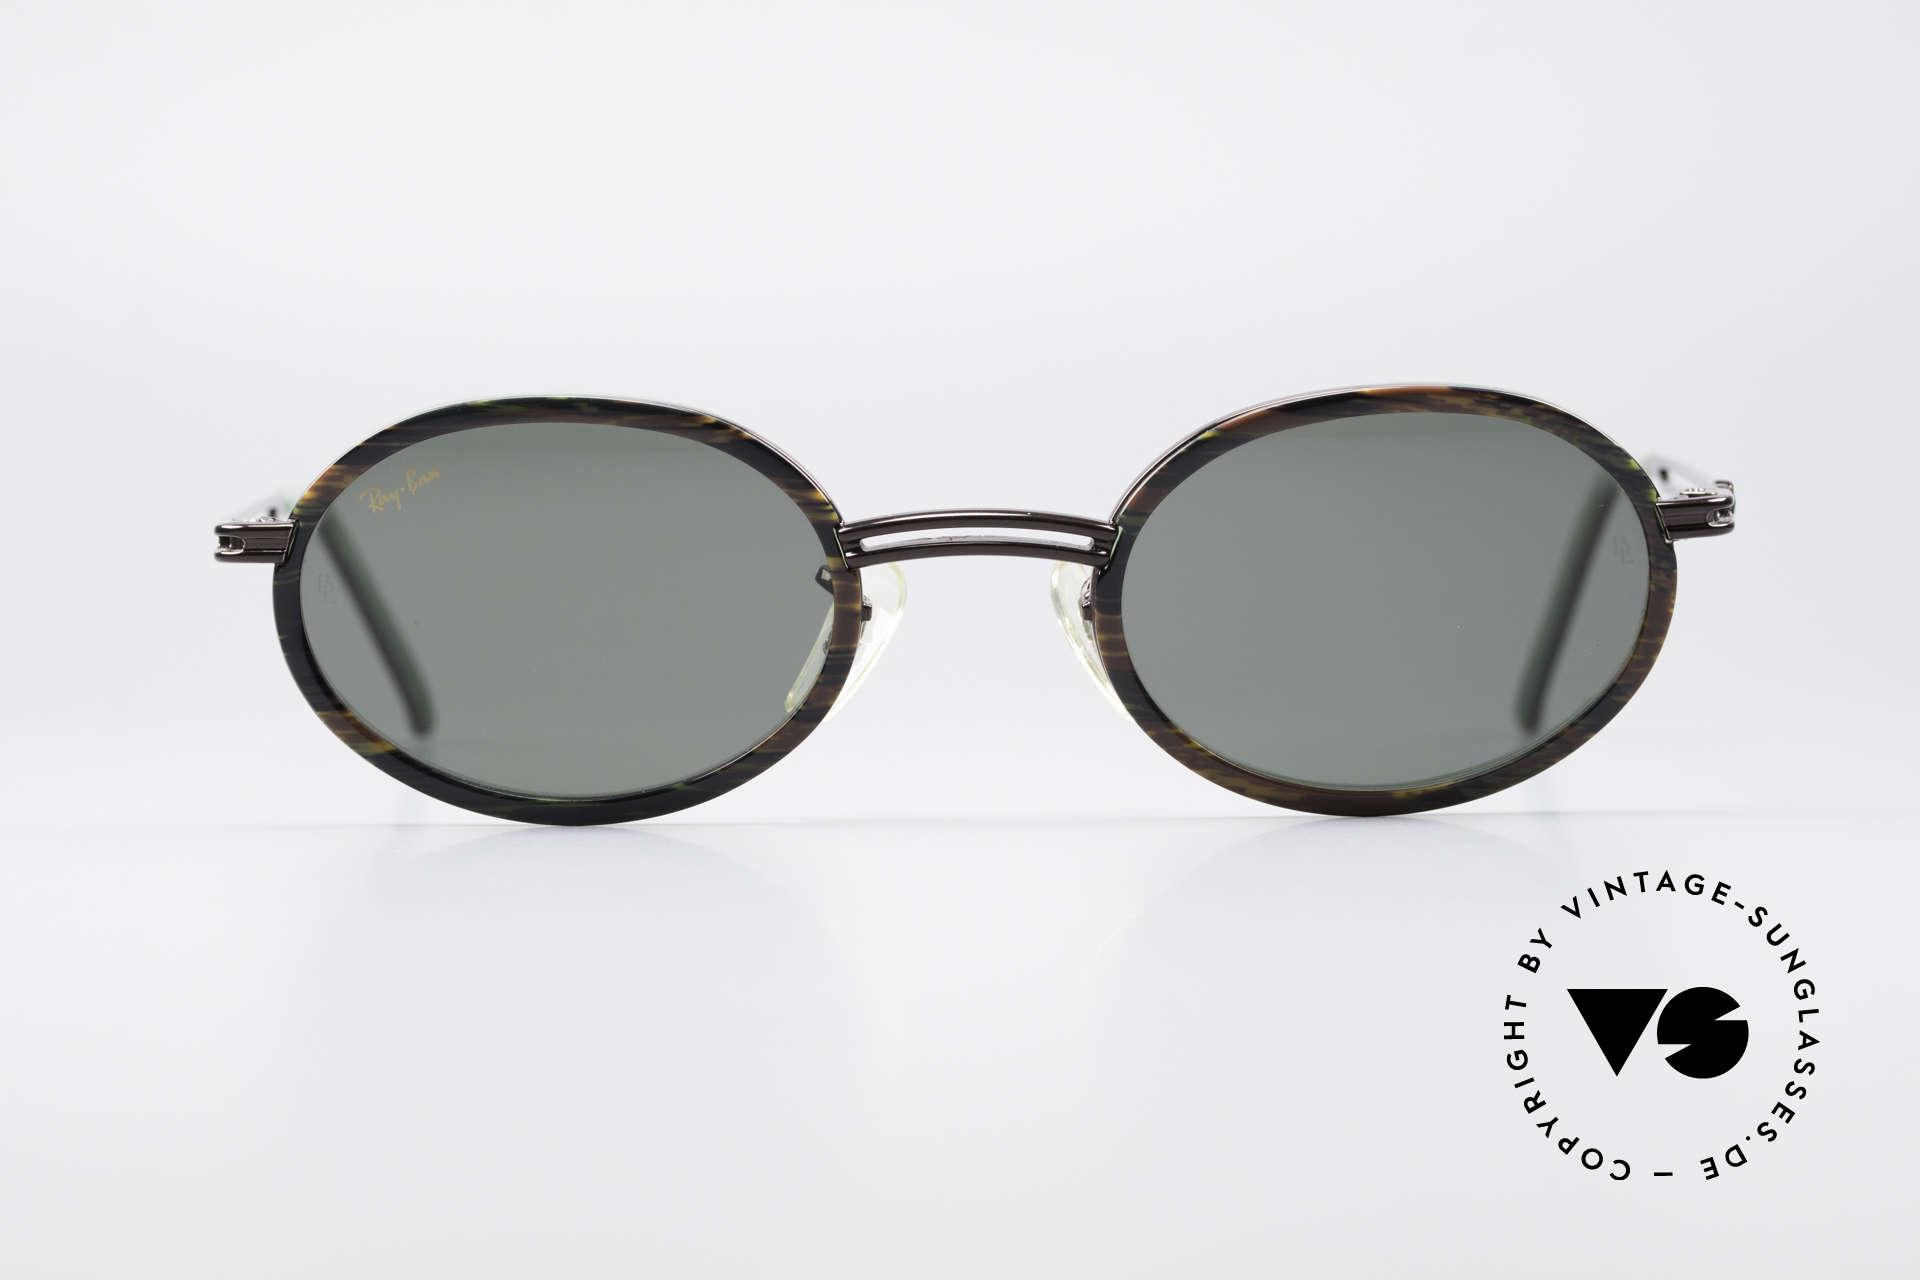 21d17b5478 Sunglasses Ray Ban Rituals Combo Oval 90 s Ray Ban Sunglasses W3085 ...